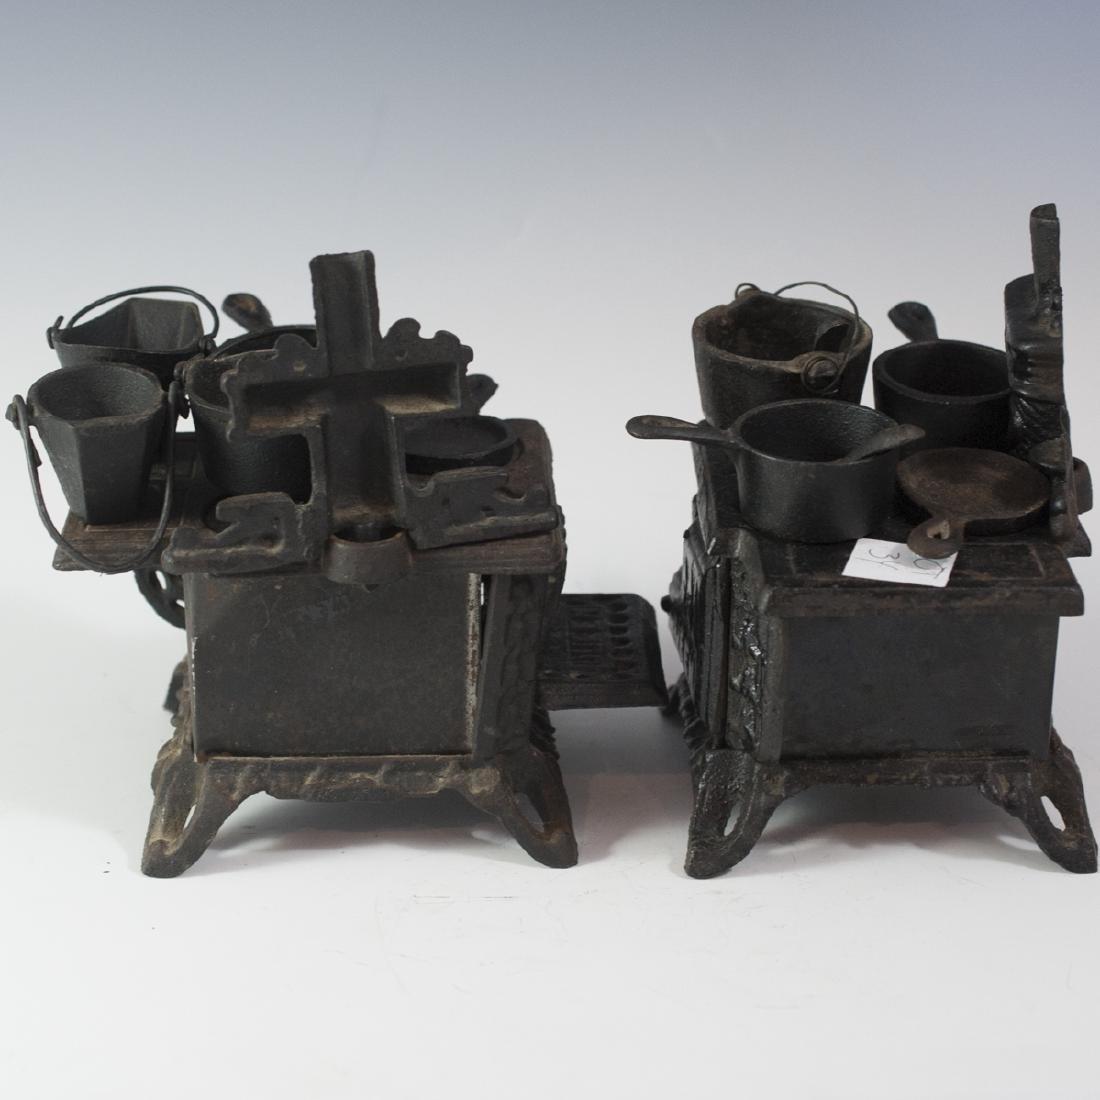 Pair of Queen Cast Iron Miniature Salesman Stoves - 5